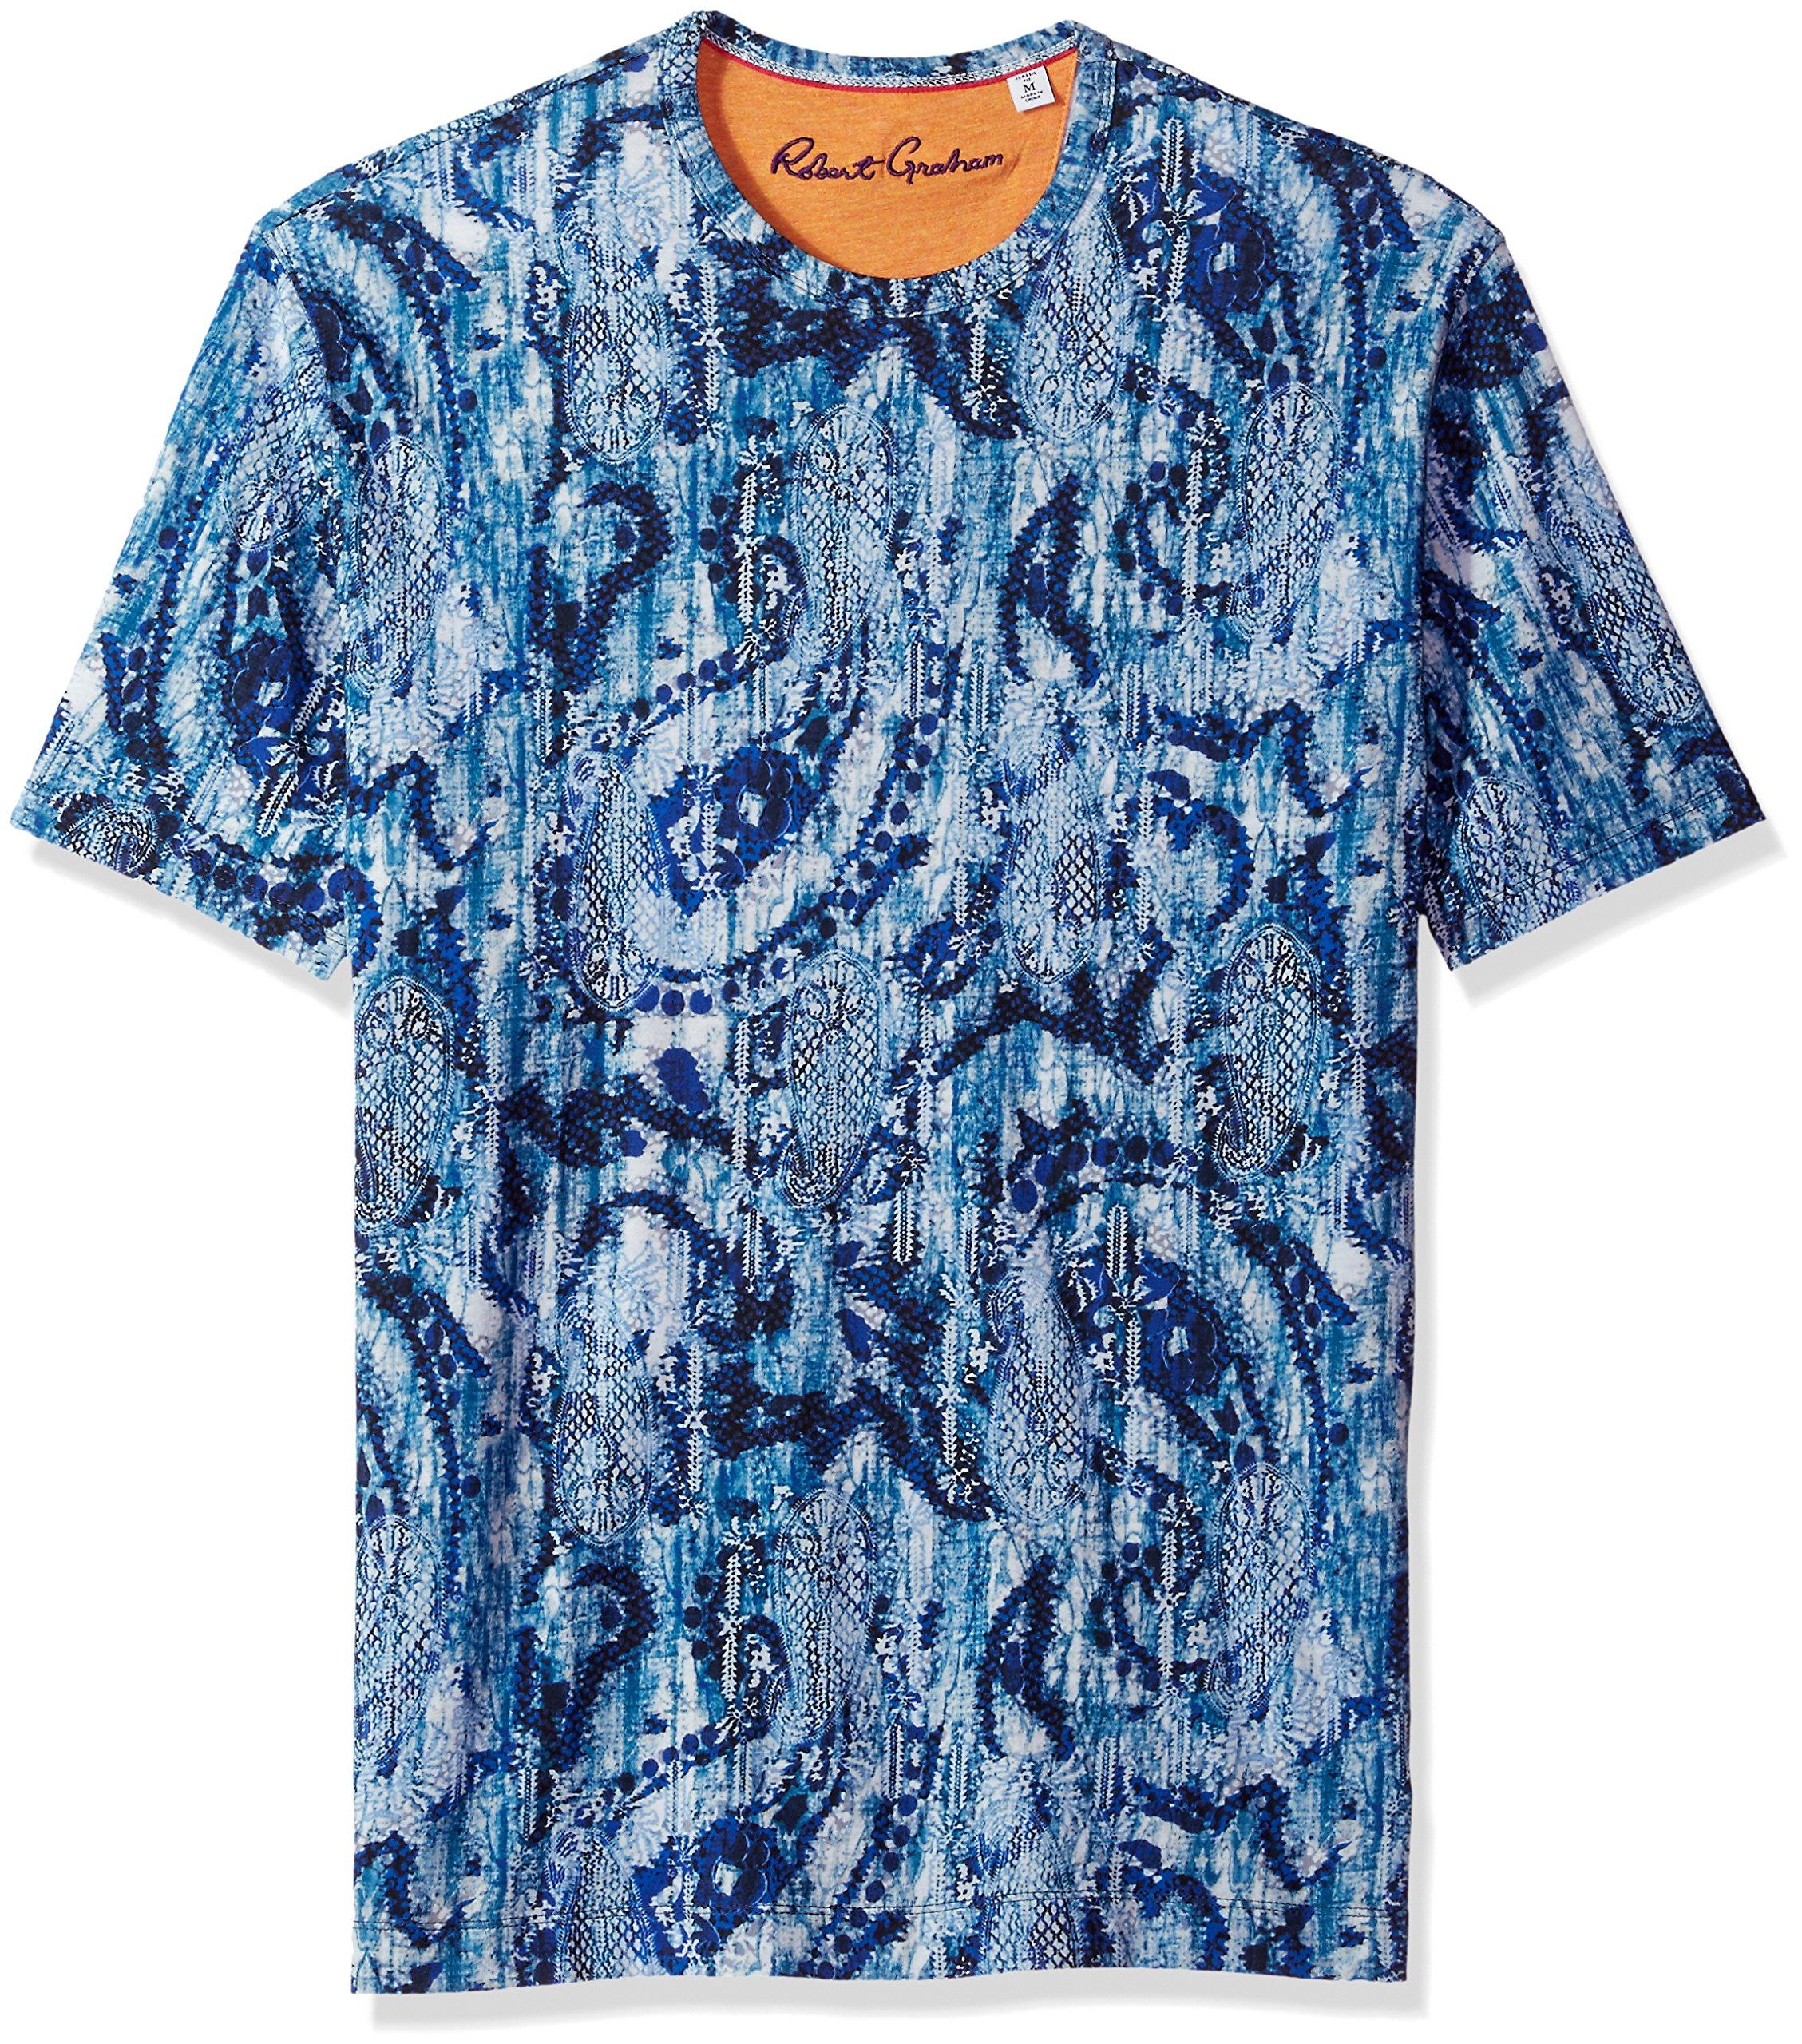 Robert Graham Men's Islets Cotton Modul Short Sleeve Knit Tee, Blue, Large